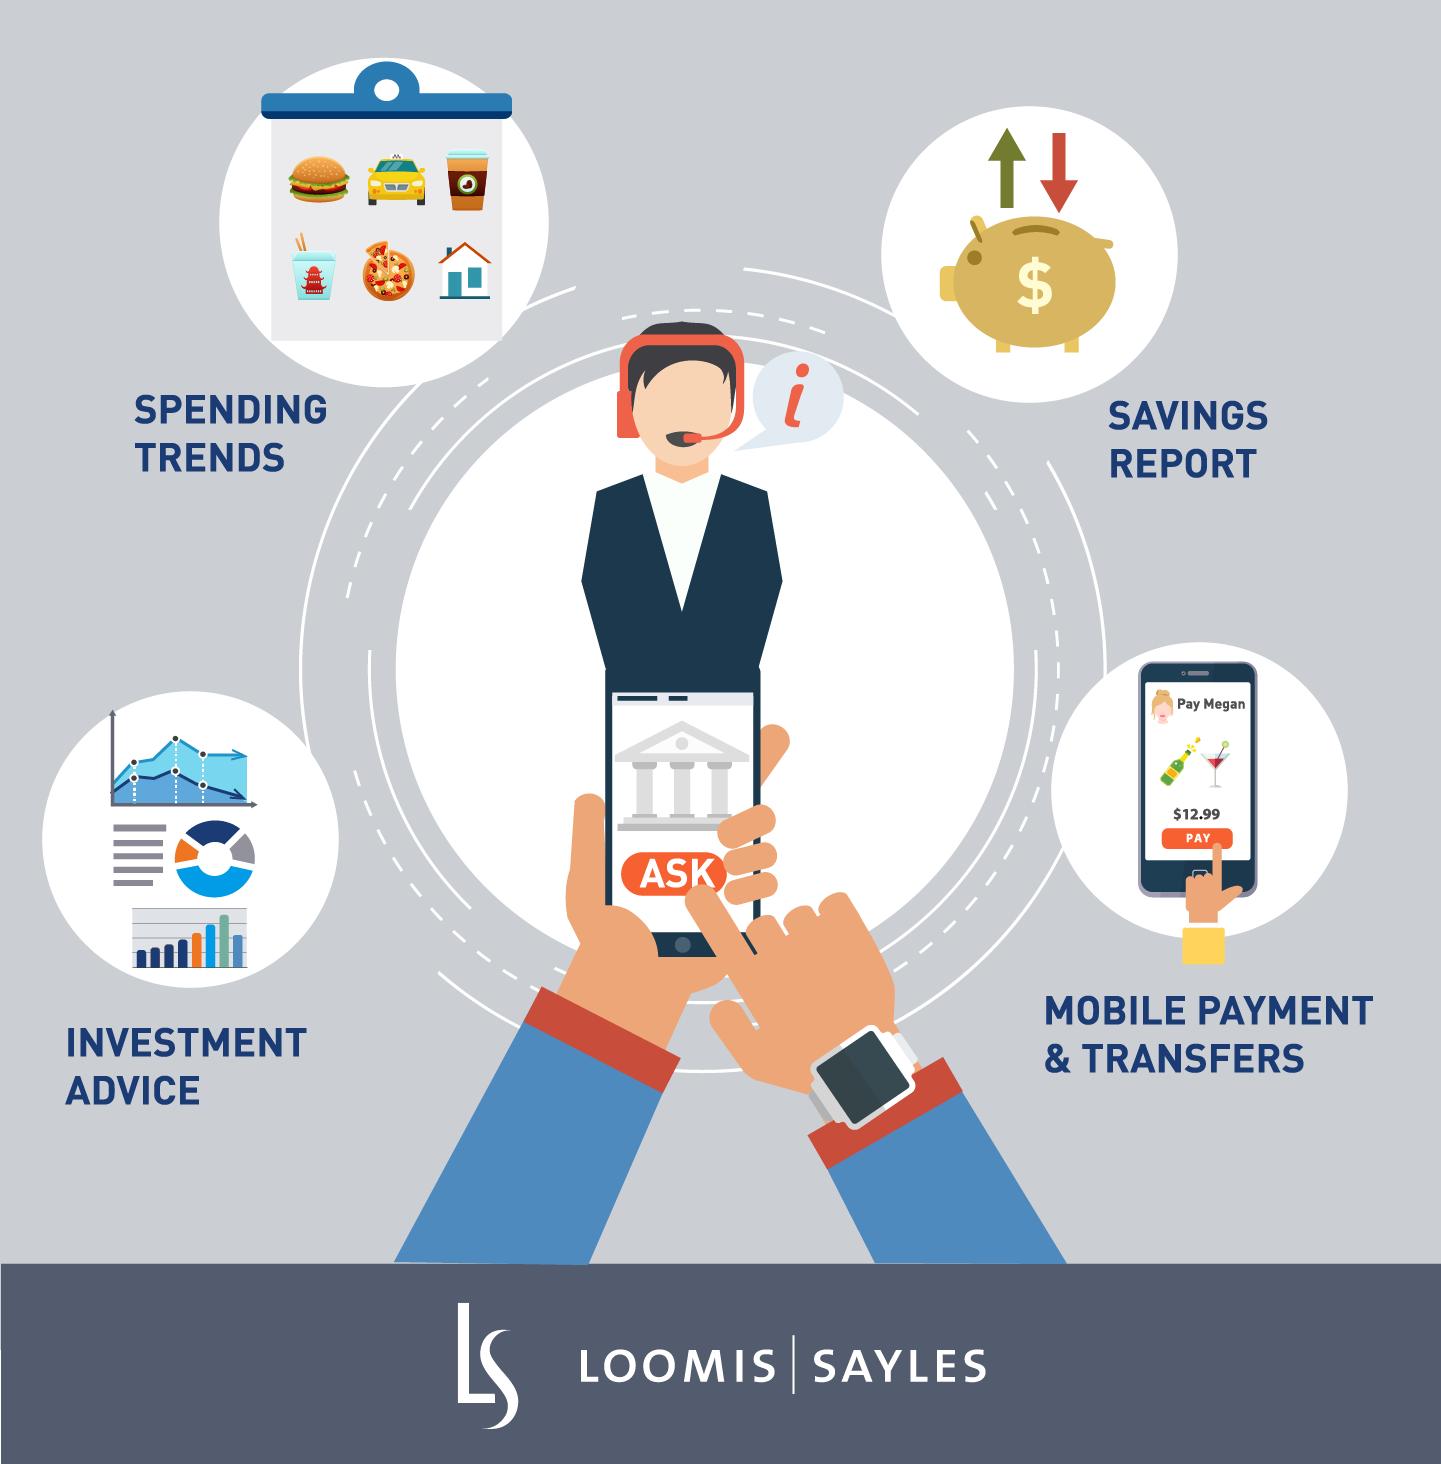 Ask Erica_Virtual Financial Advisor_Loomis Sayles.png